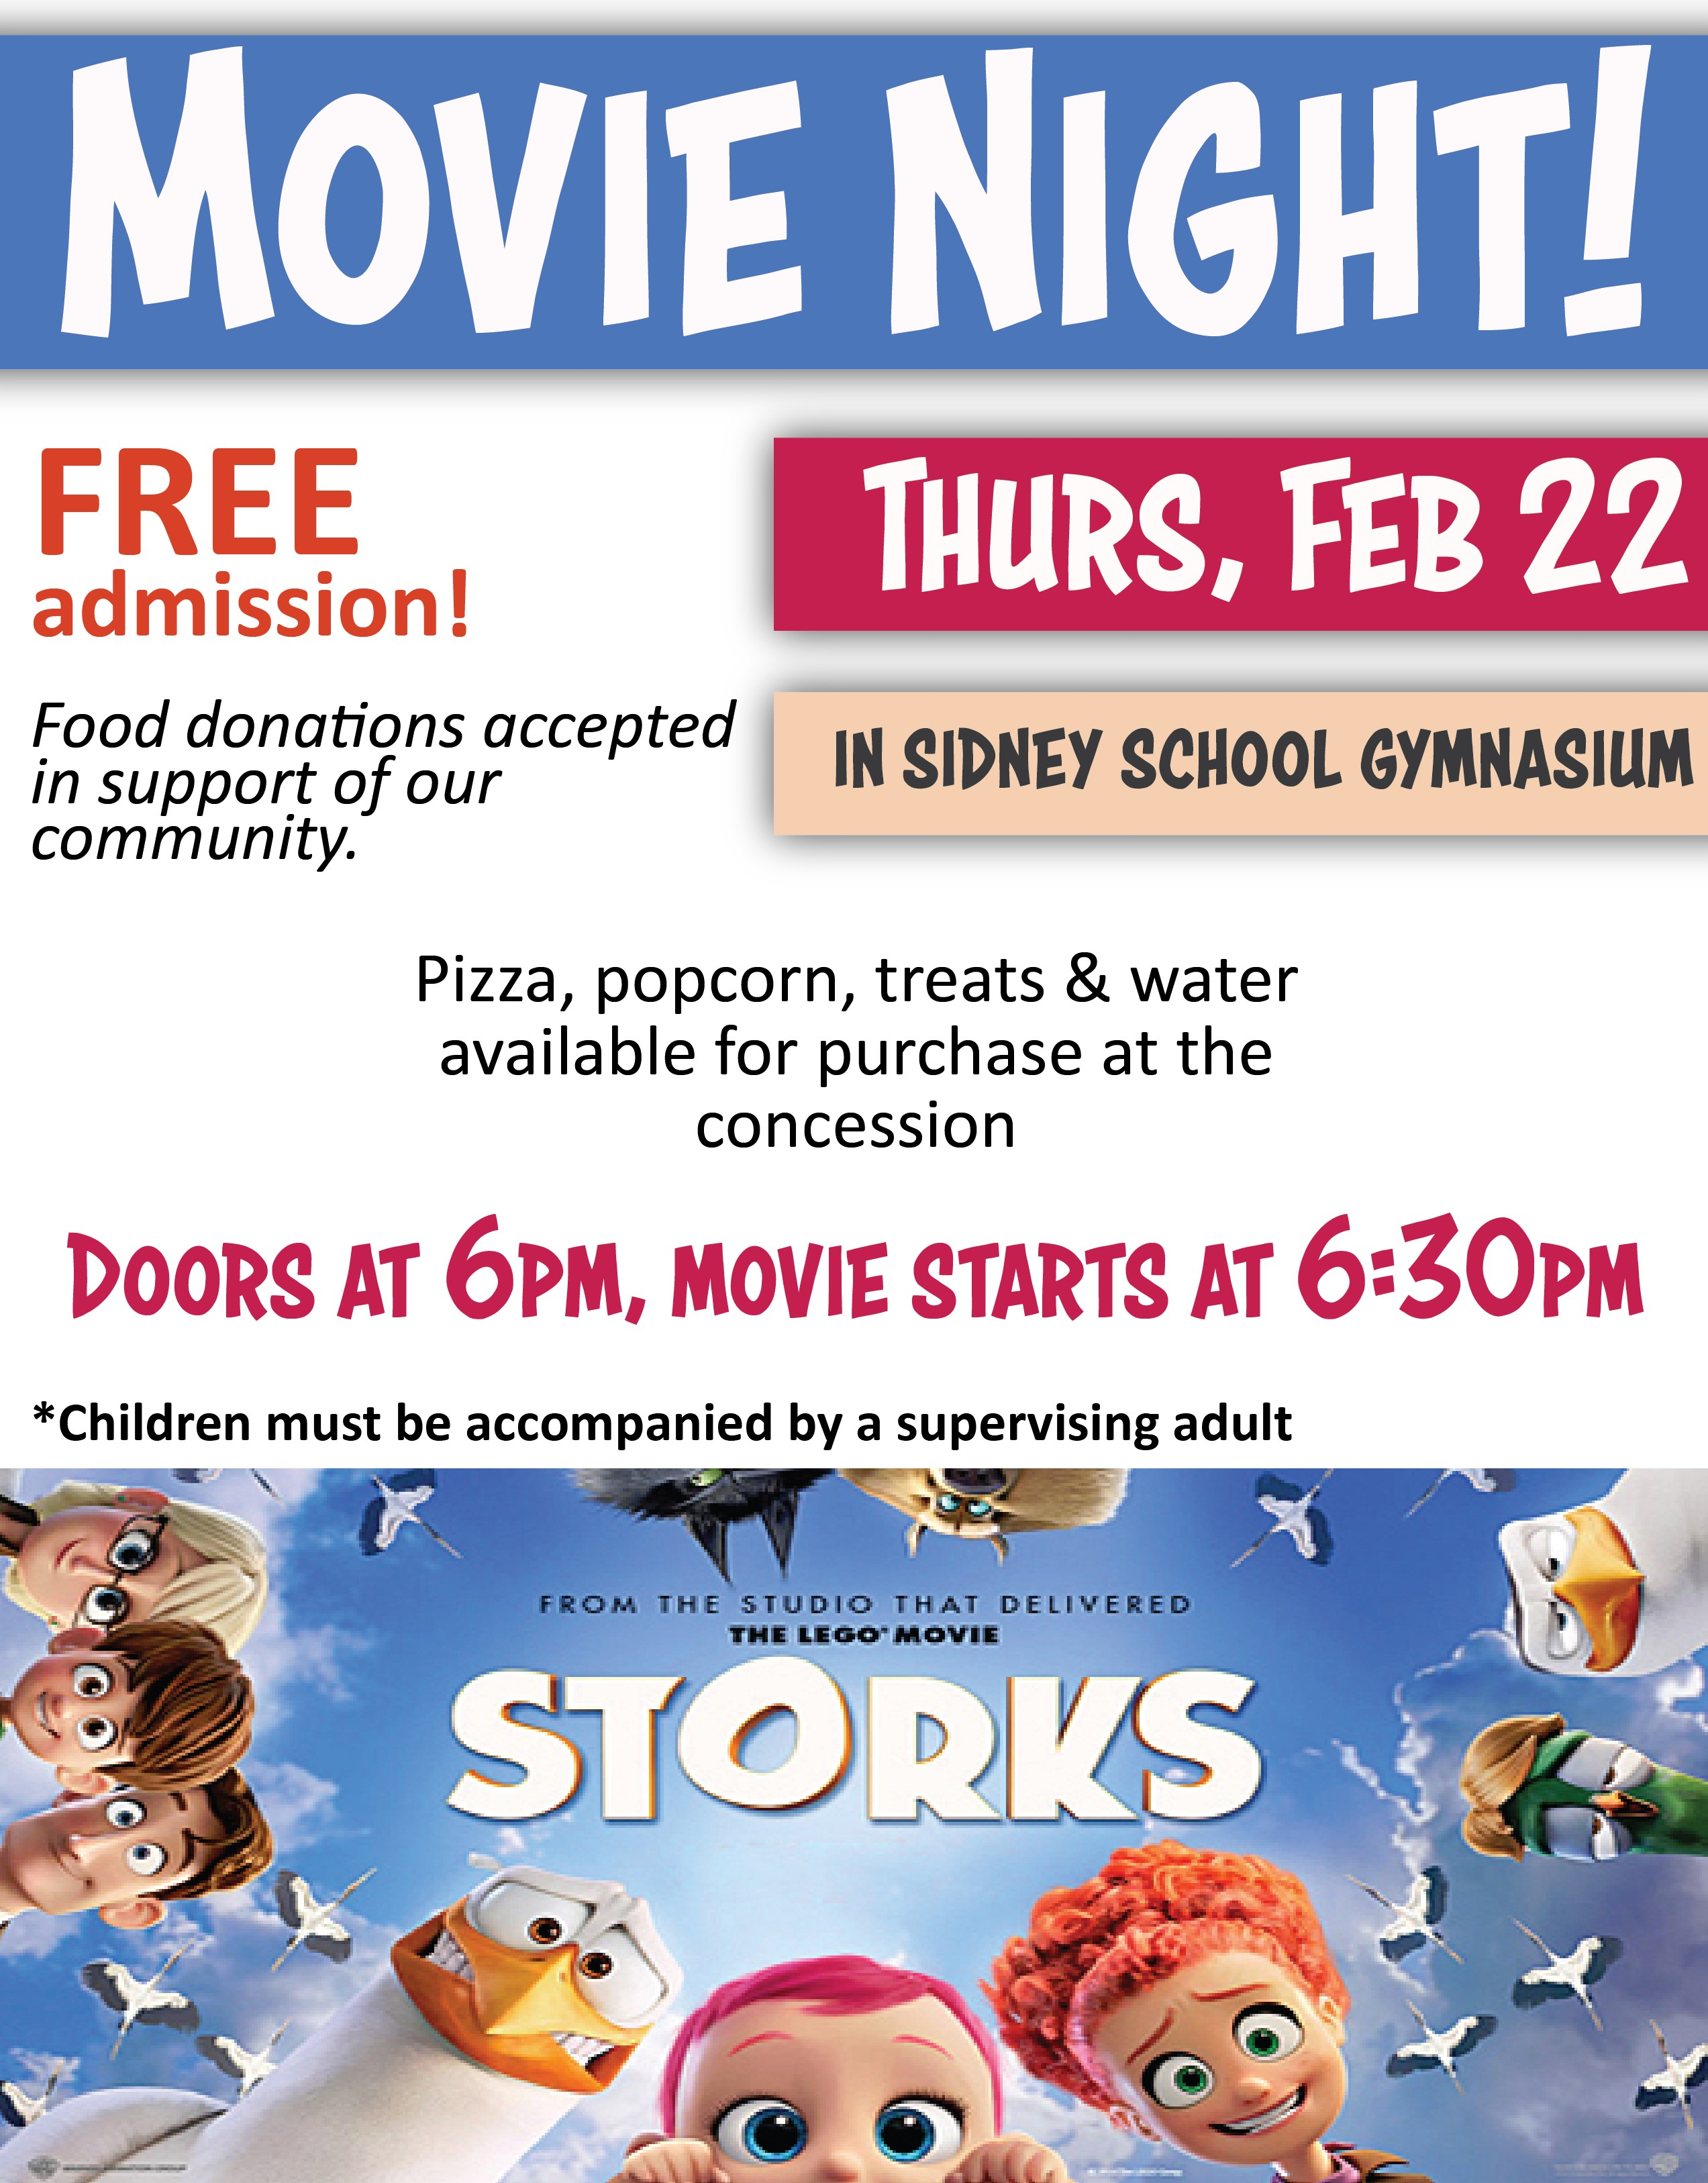 Movie Night poster - Storks. Feb 22nd, doors at 6pm, movie start at 6:30